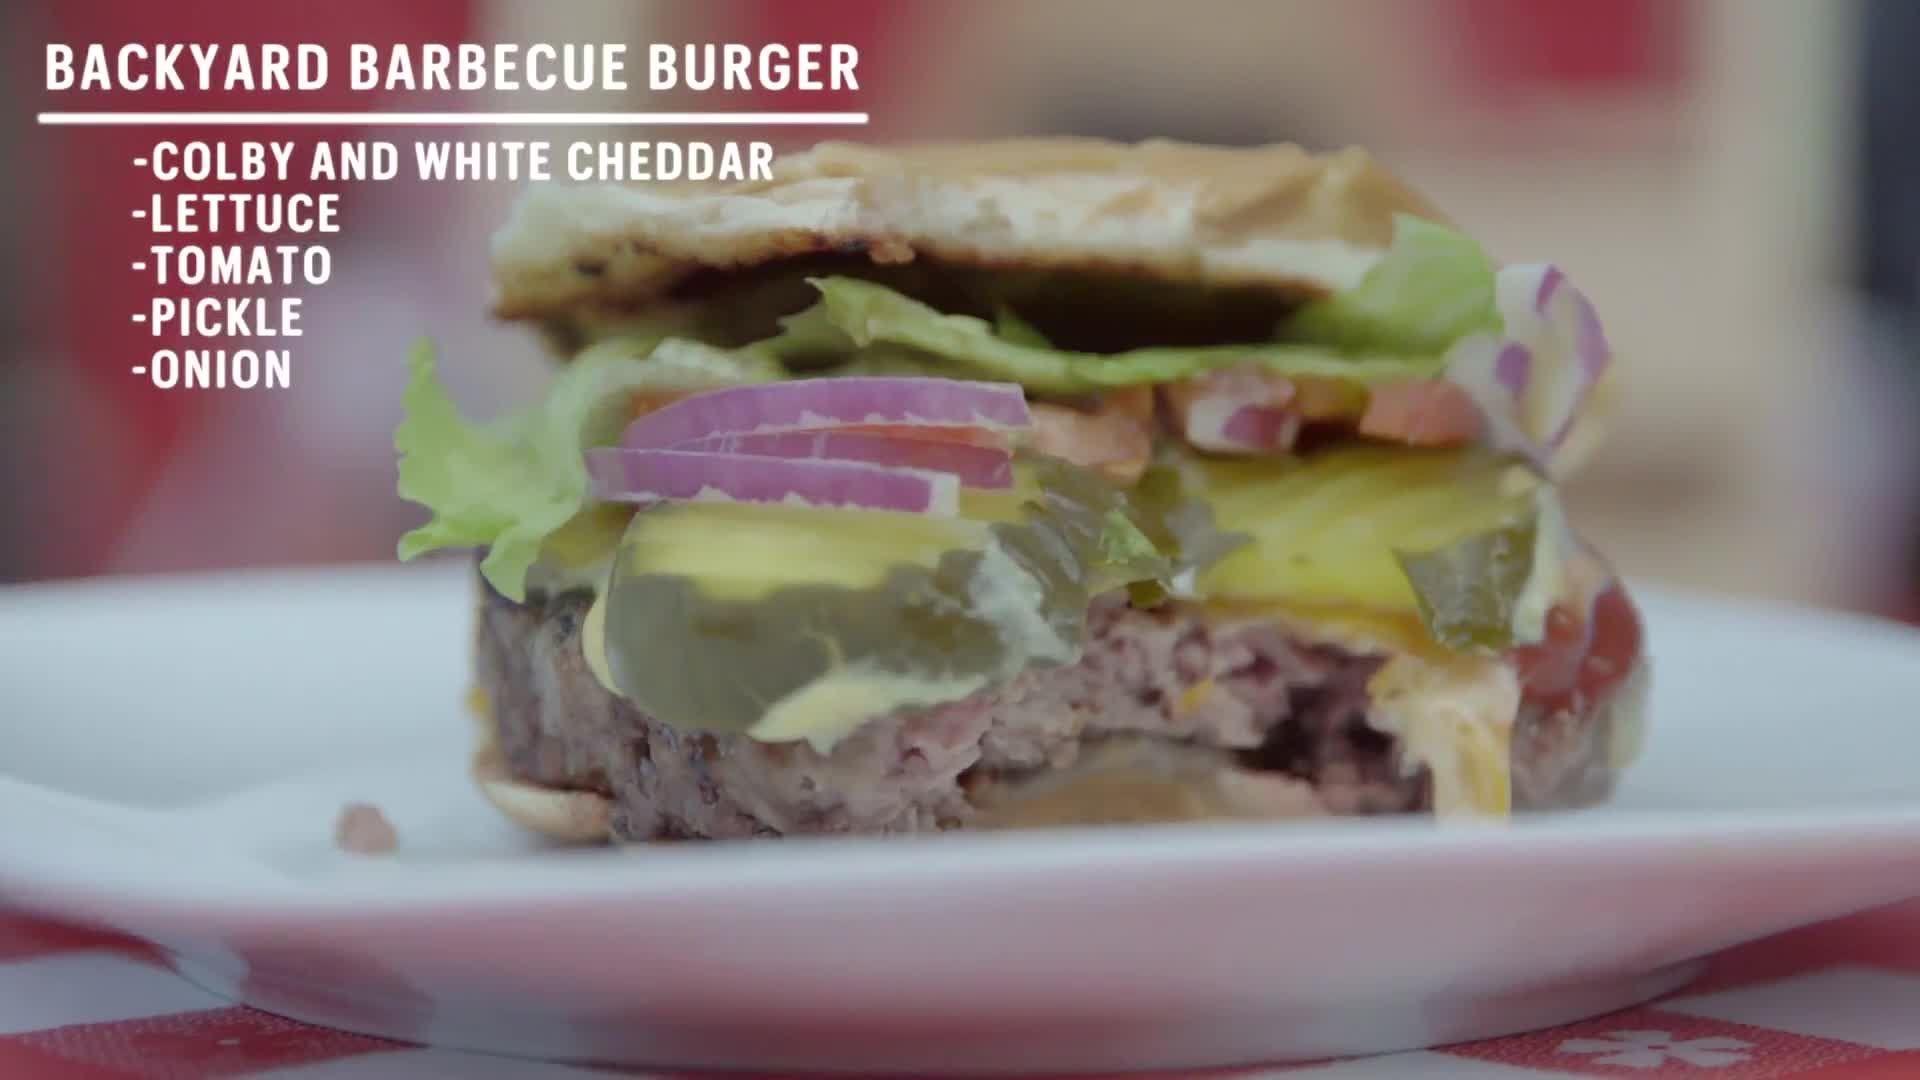 19 of the Meatiest, Juiciest, Gnarliest Burgers to Inspire Your Labor Day Weekend